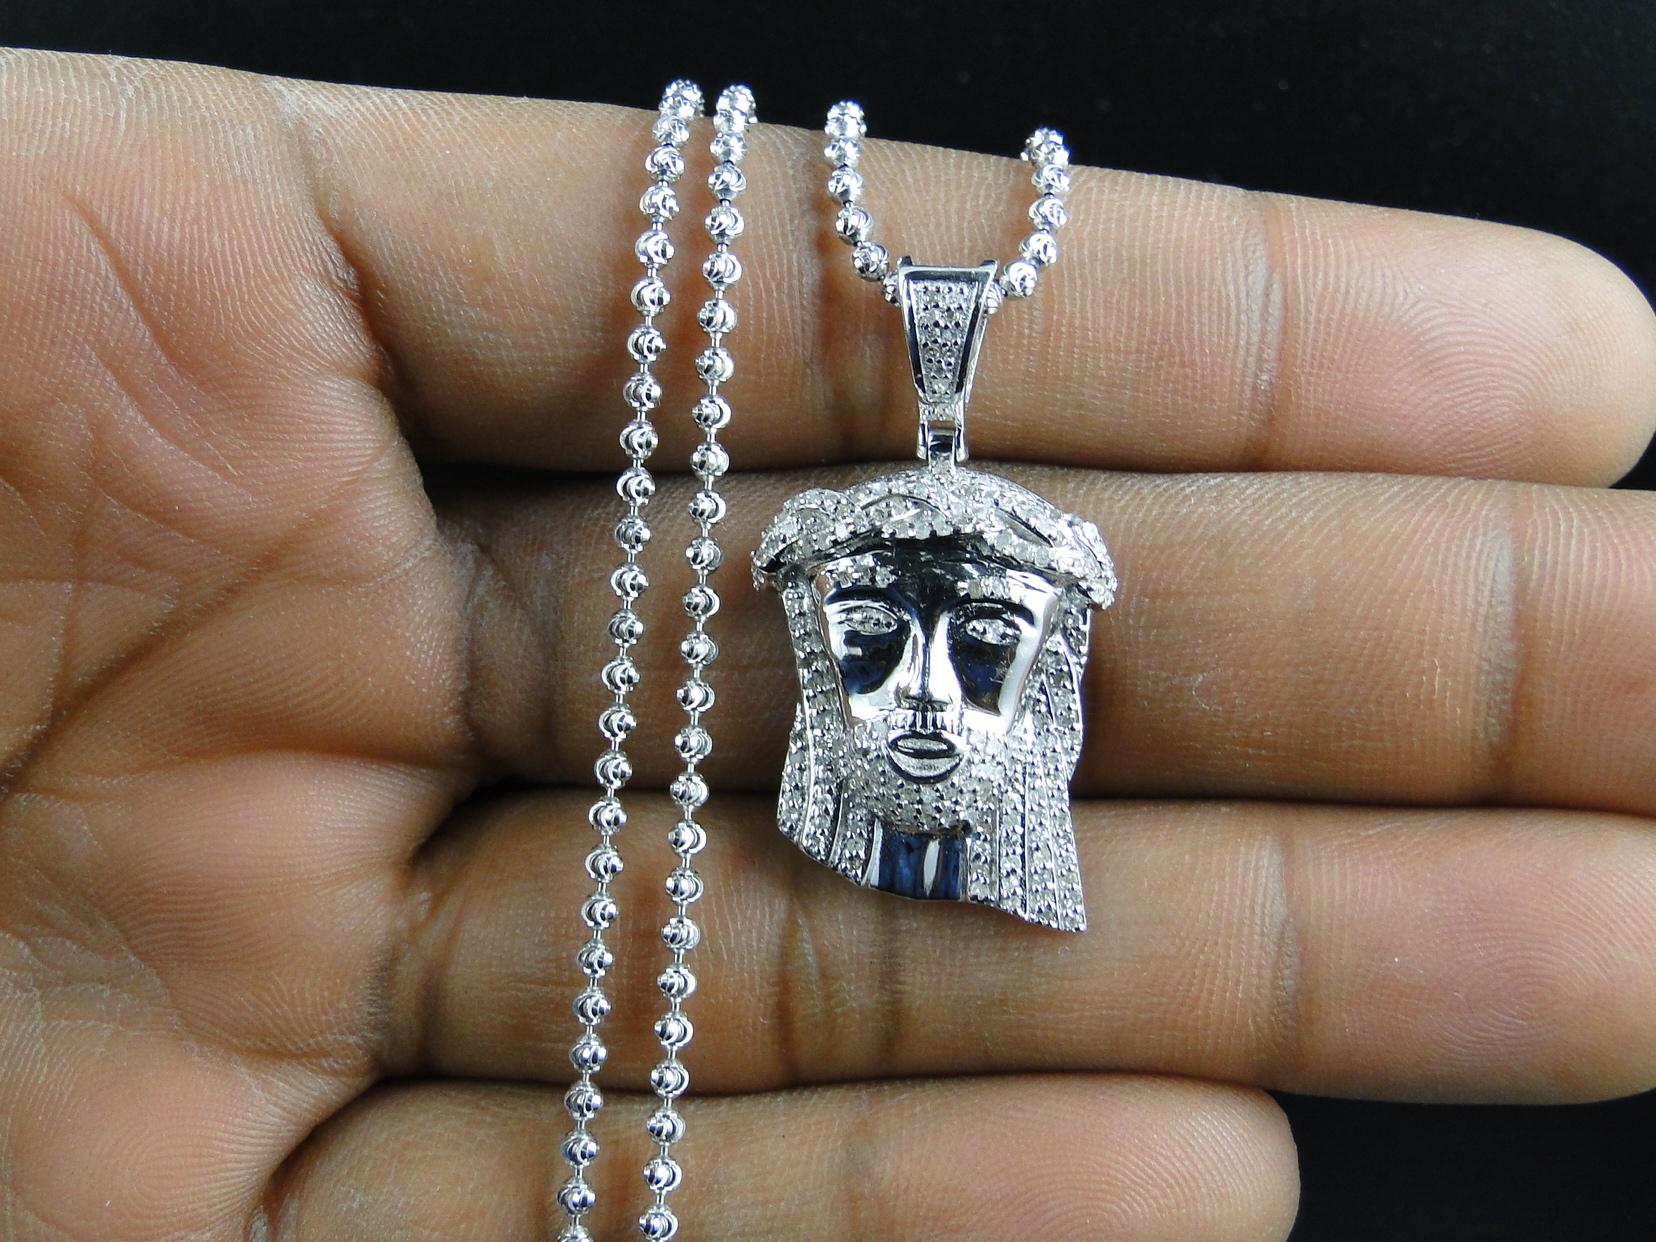 Sterling silver jesus piece real diamond pendant and chain in white sterling silver jesus piece real diamond pendant and chain in white gold finish 686907157377 ebay aloadofball Image collections